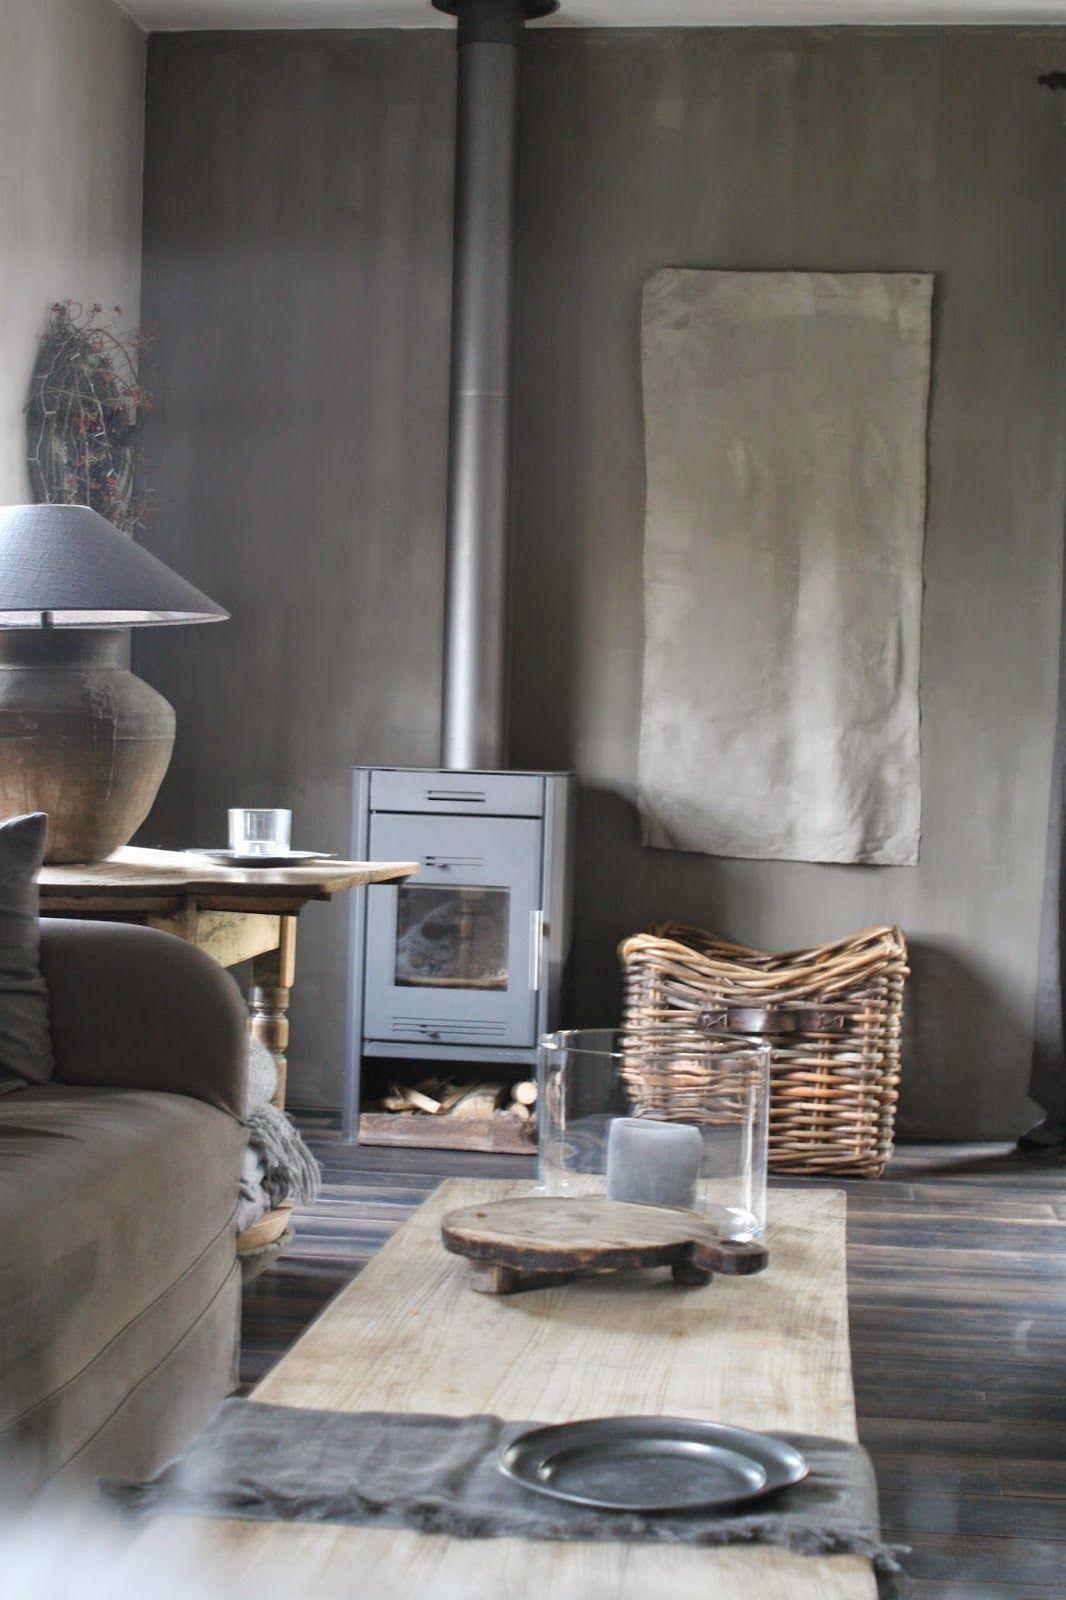 Landelijk interieur en stijl meiling interieur decoratie - Interieur industriele stijl decoratie ...